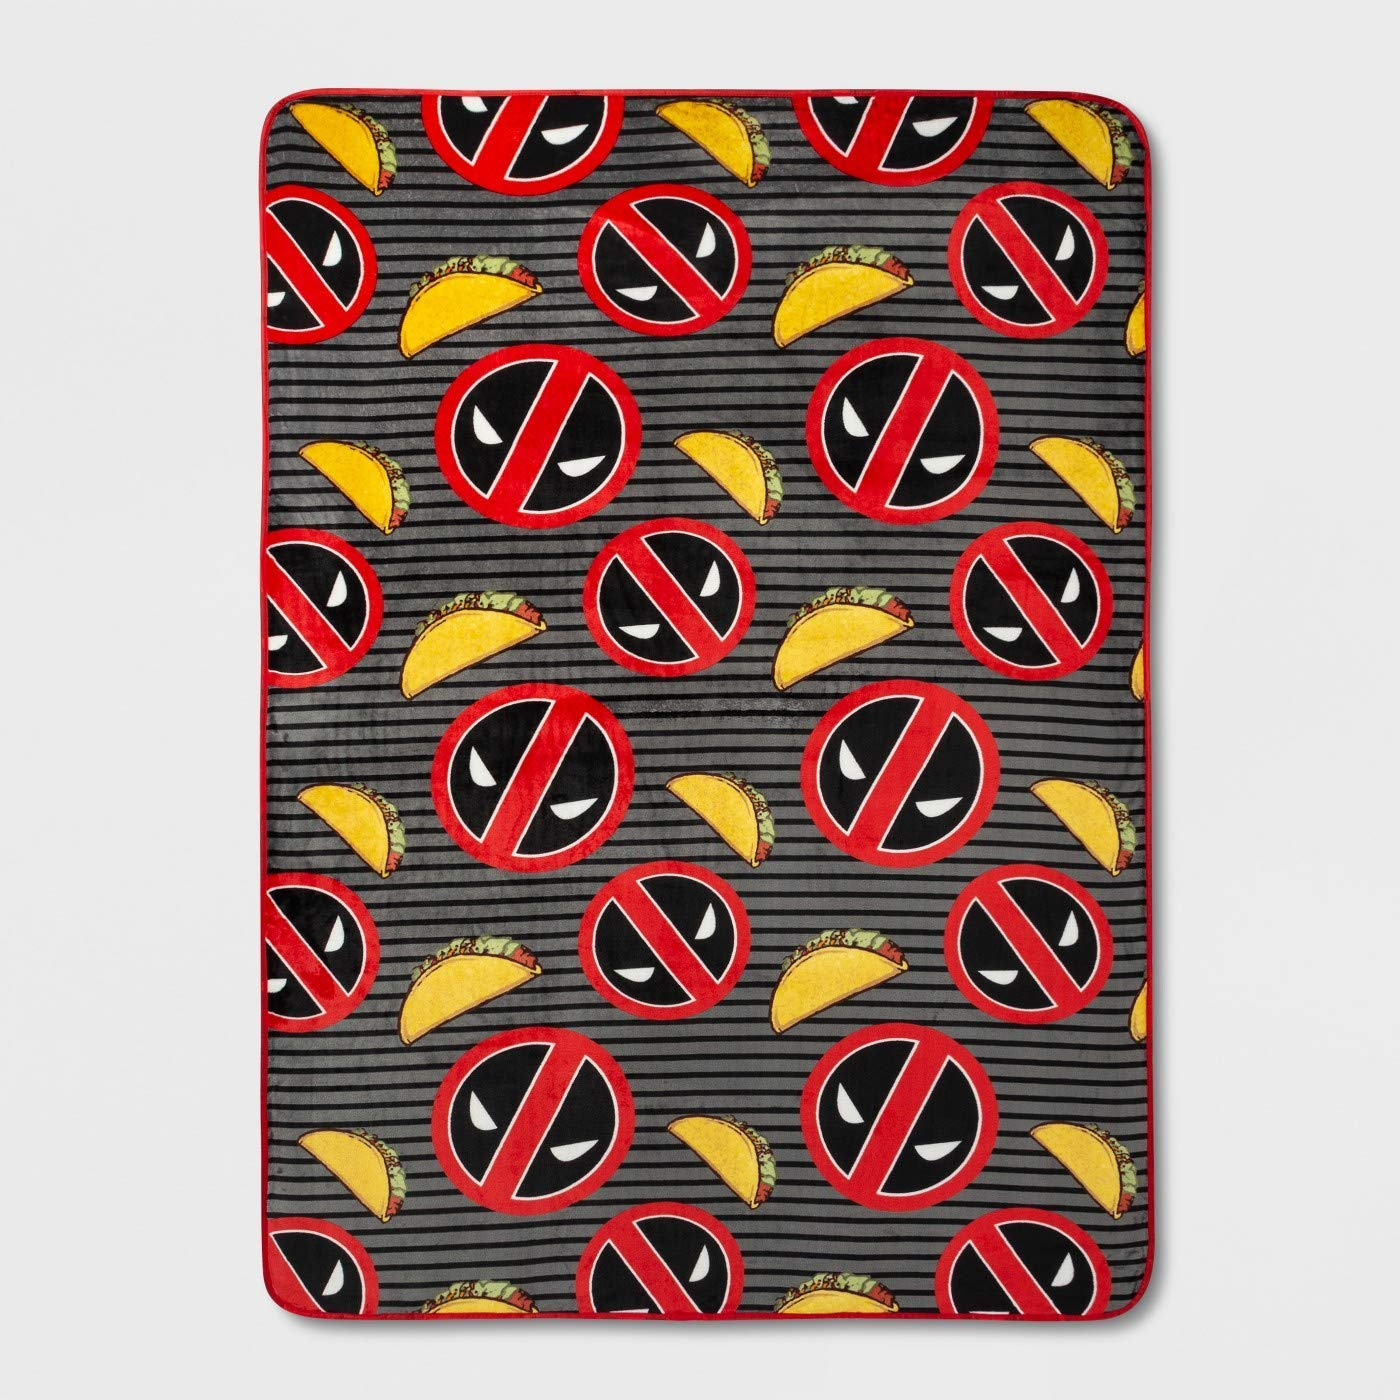 Franco Marvel Deadpool Twin Blanket 62 x 90 Inches